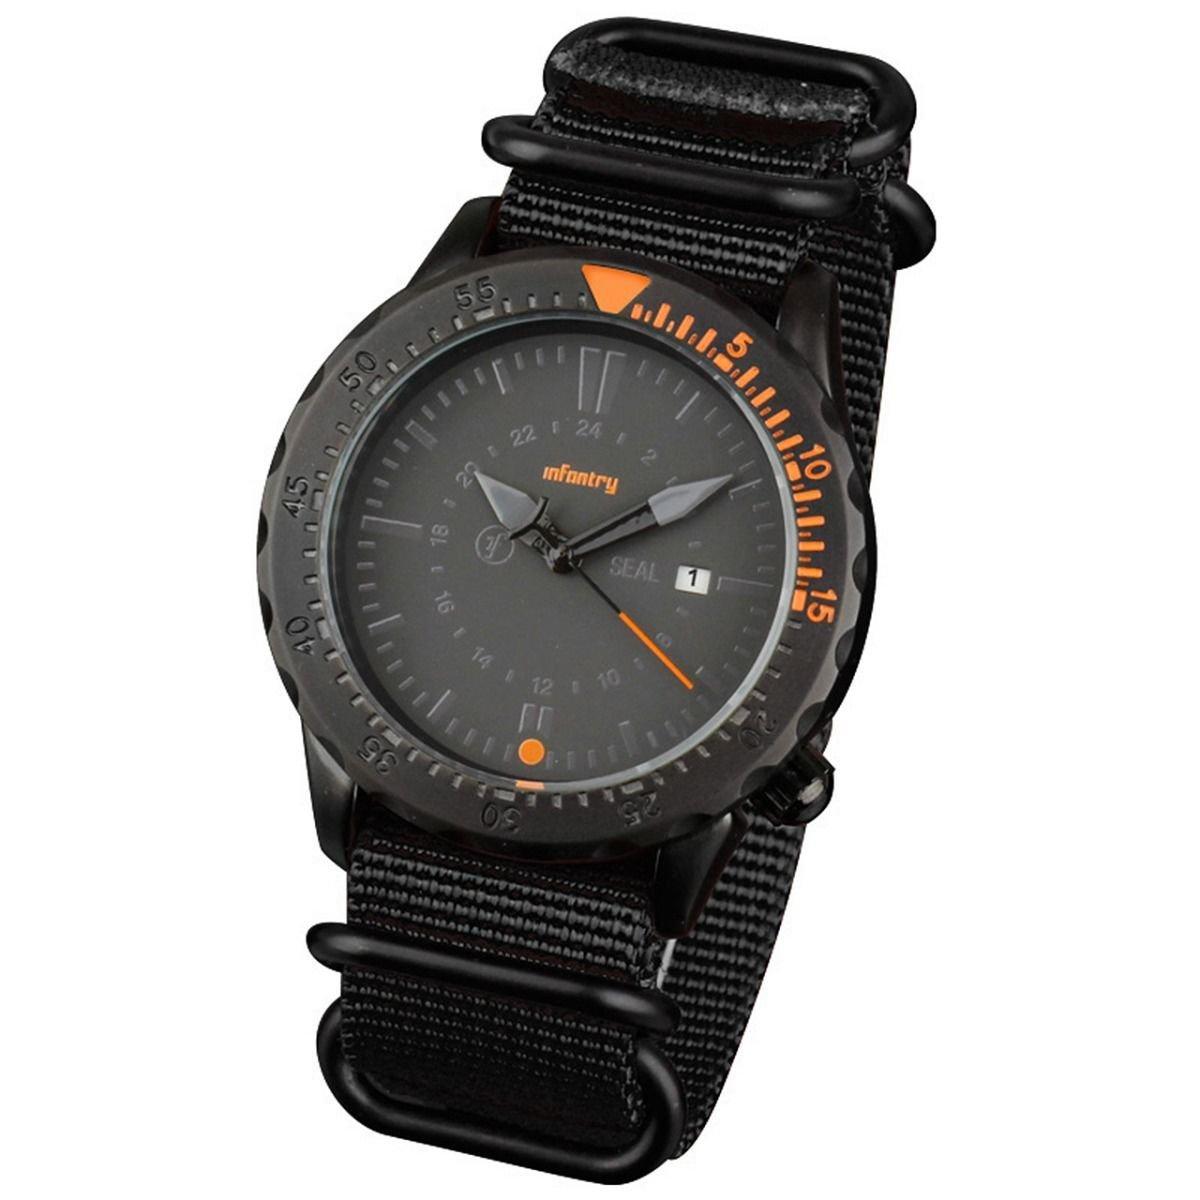 Black Band and Orange Infantry Mens Sport Quartz Watch Tachymeter Bezel Nylon